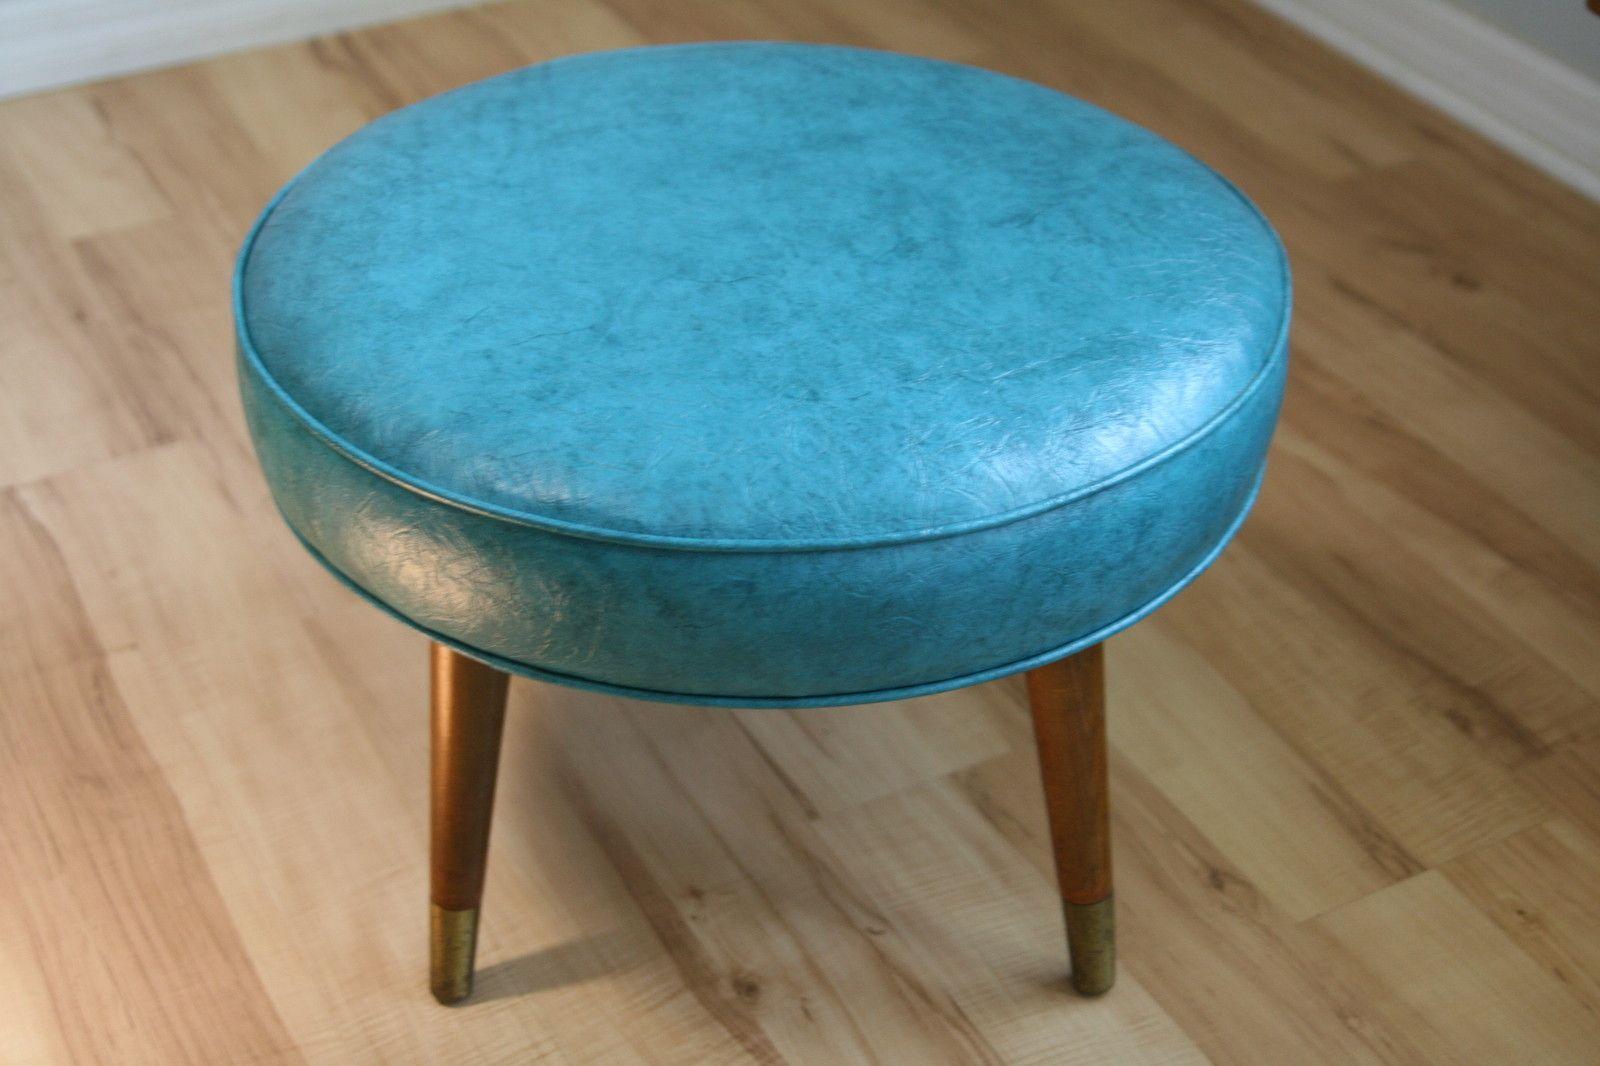 Ebay 130733436536 Mid Century Modern Round Footstool Ottoman Retro - Retro-contemporary-round-ottoman